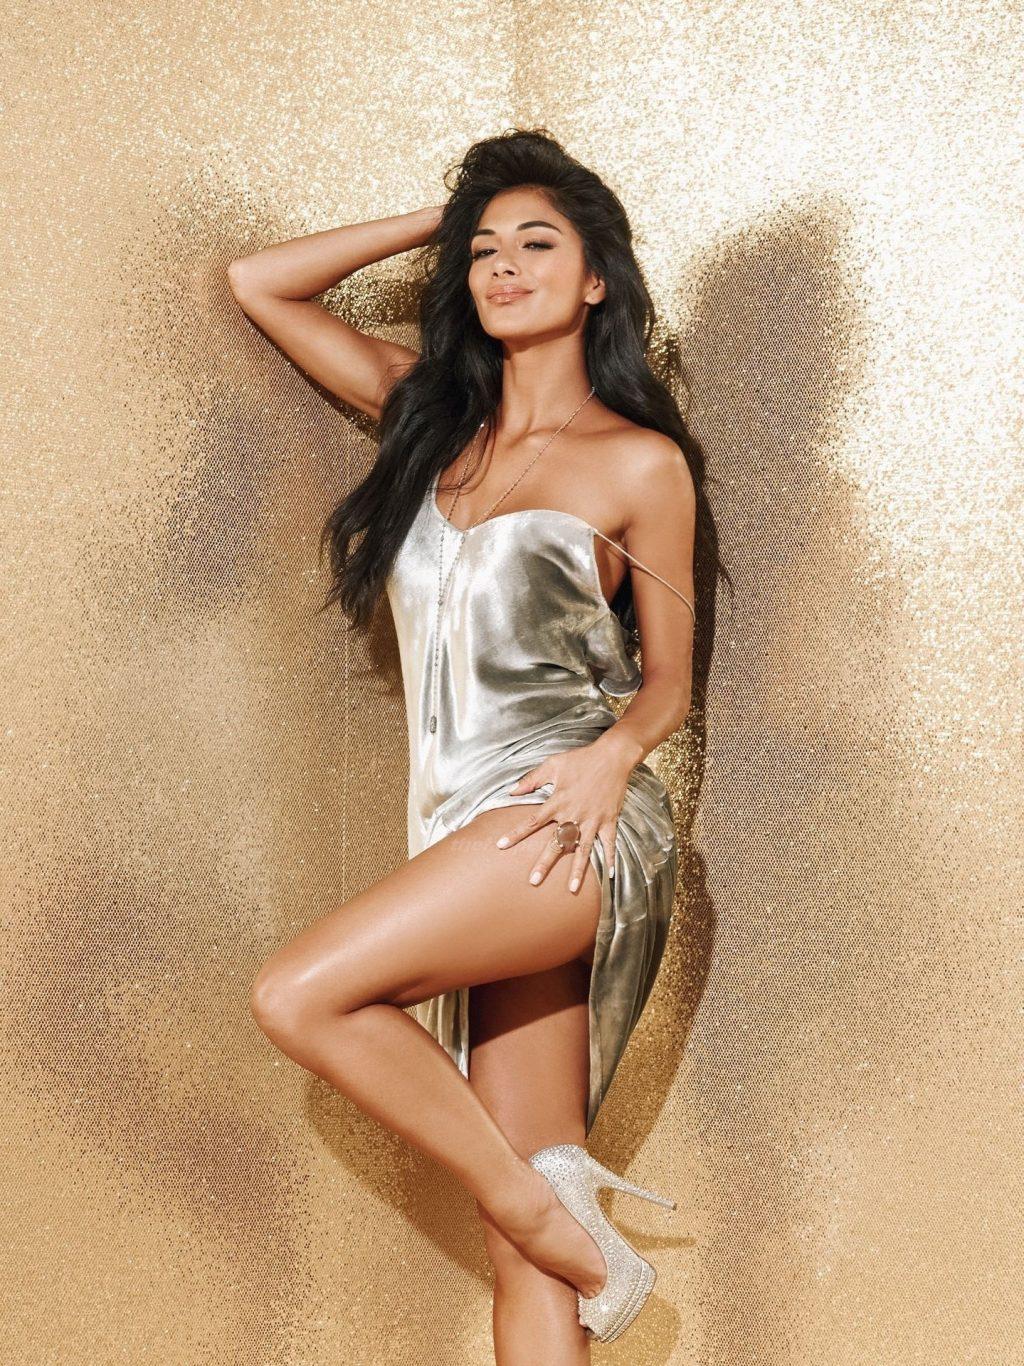 Nicole Scherzinger Looks Hot in a Sexy Shoot (14 Photos)